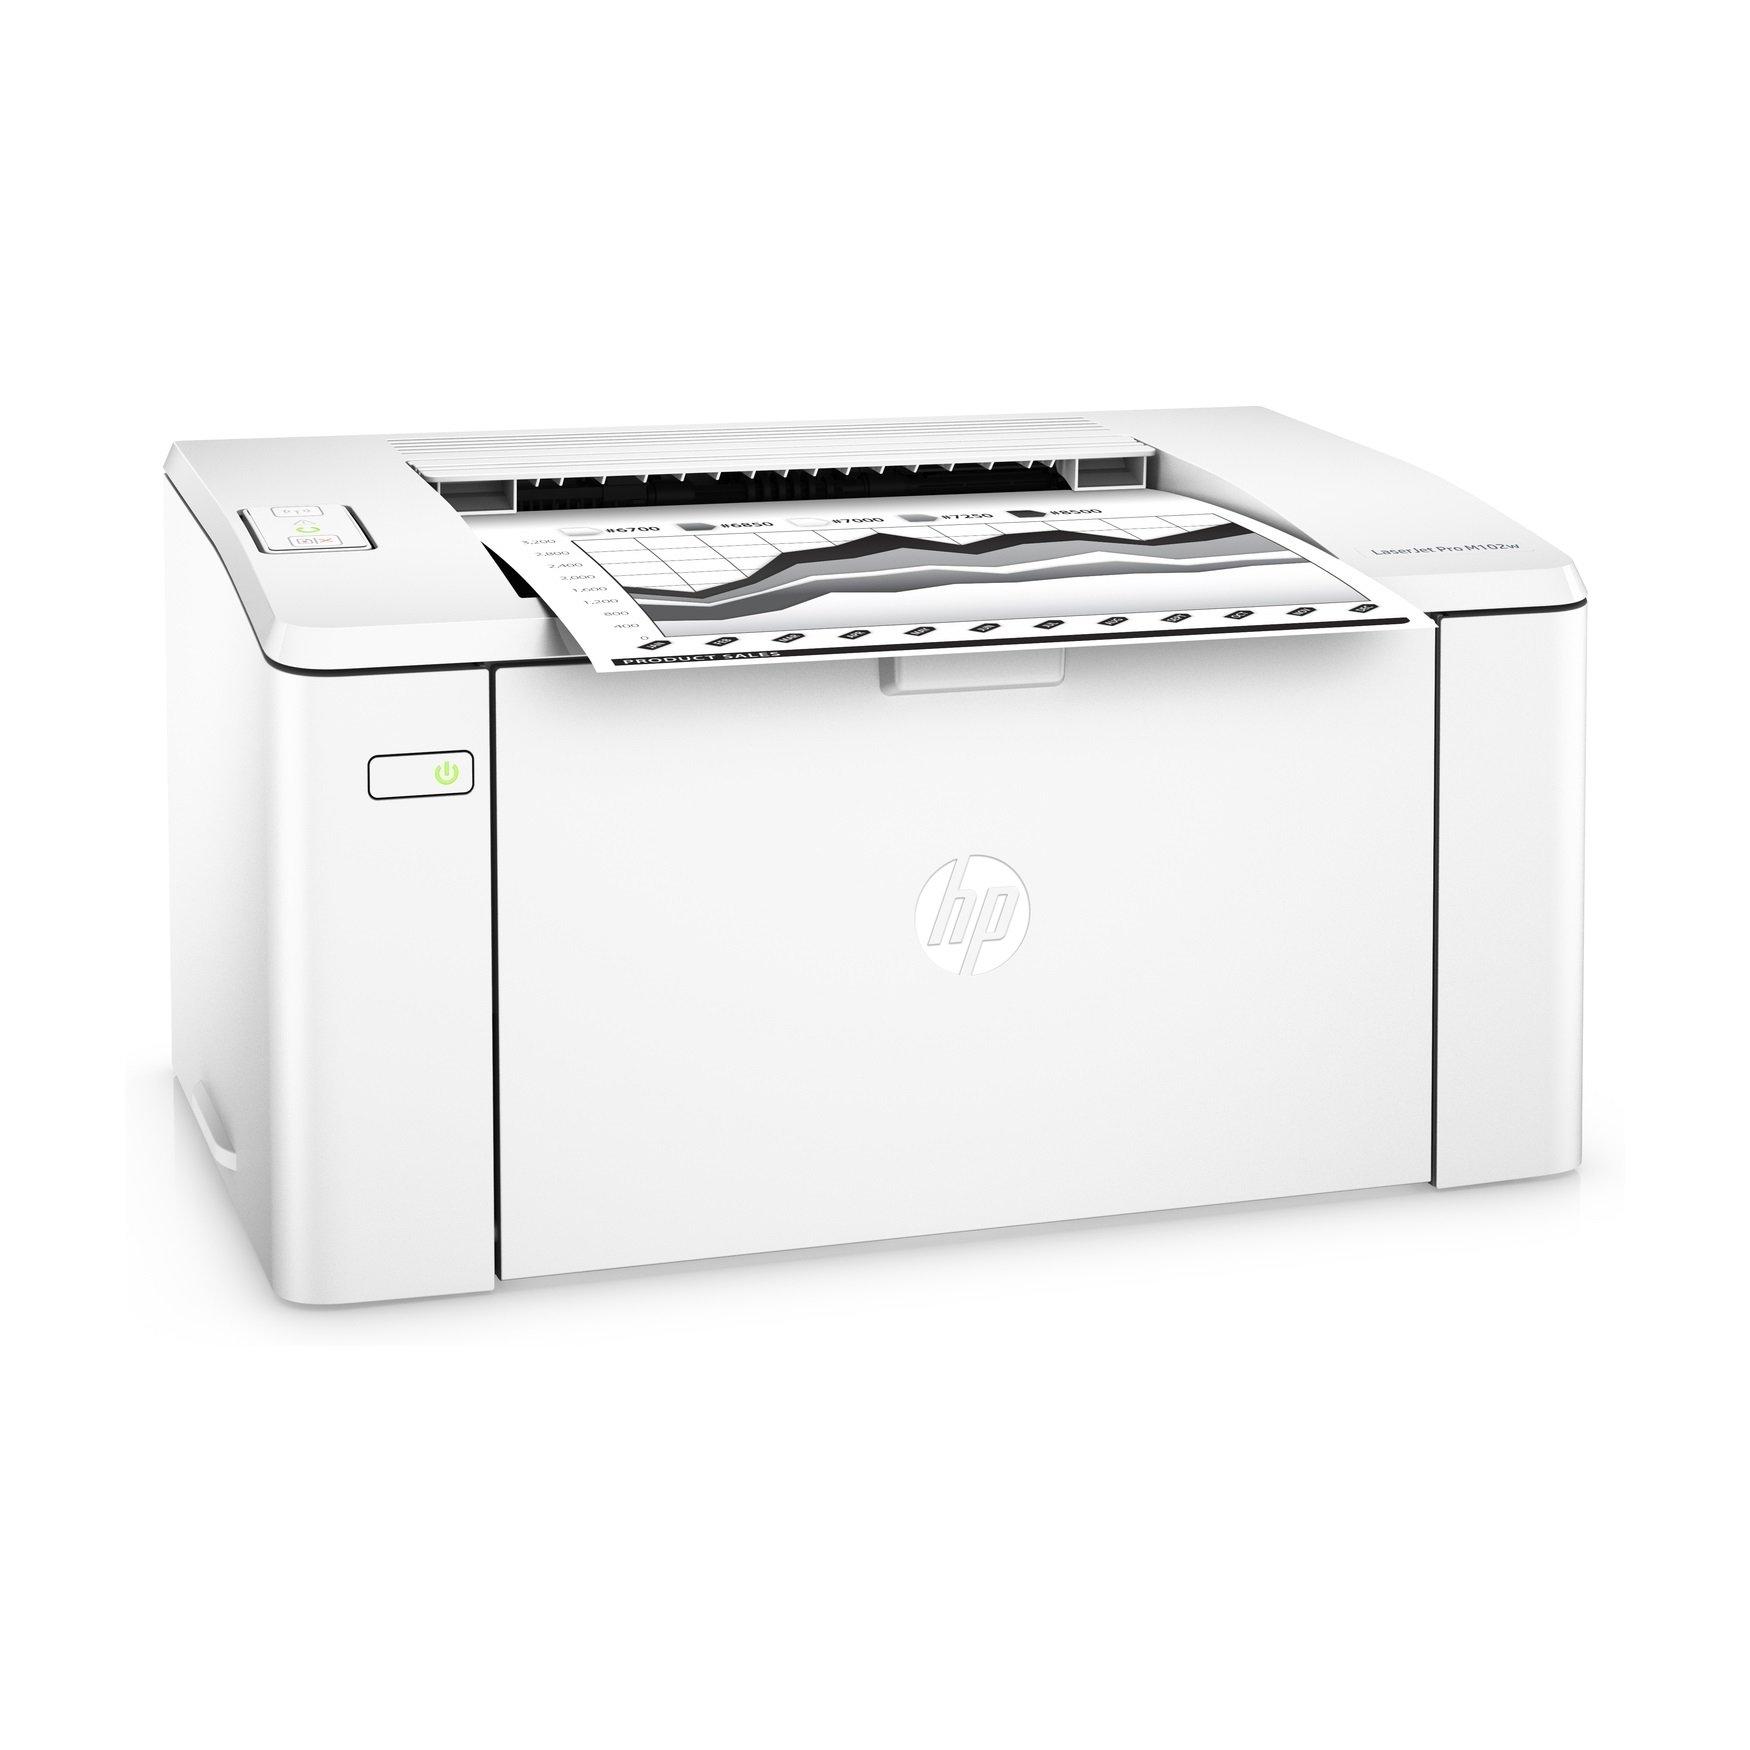 HP LaserJet Pro M102w Printer, White (Renewed)